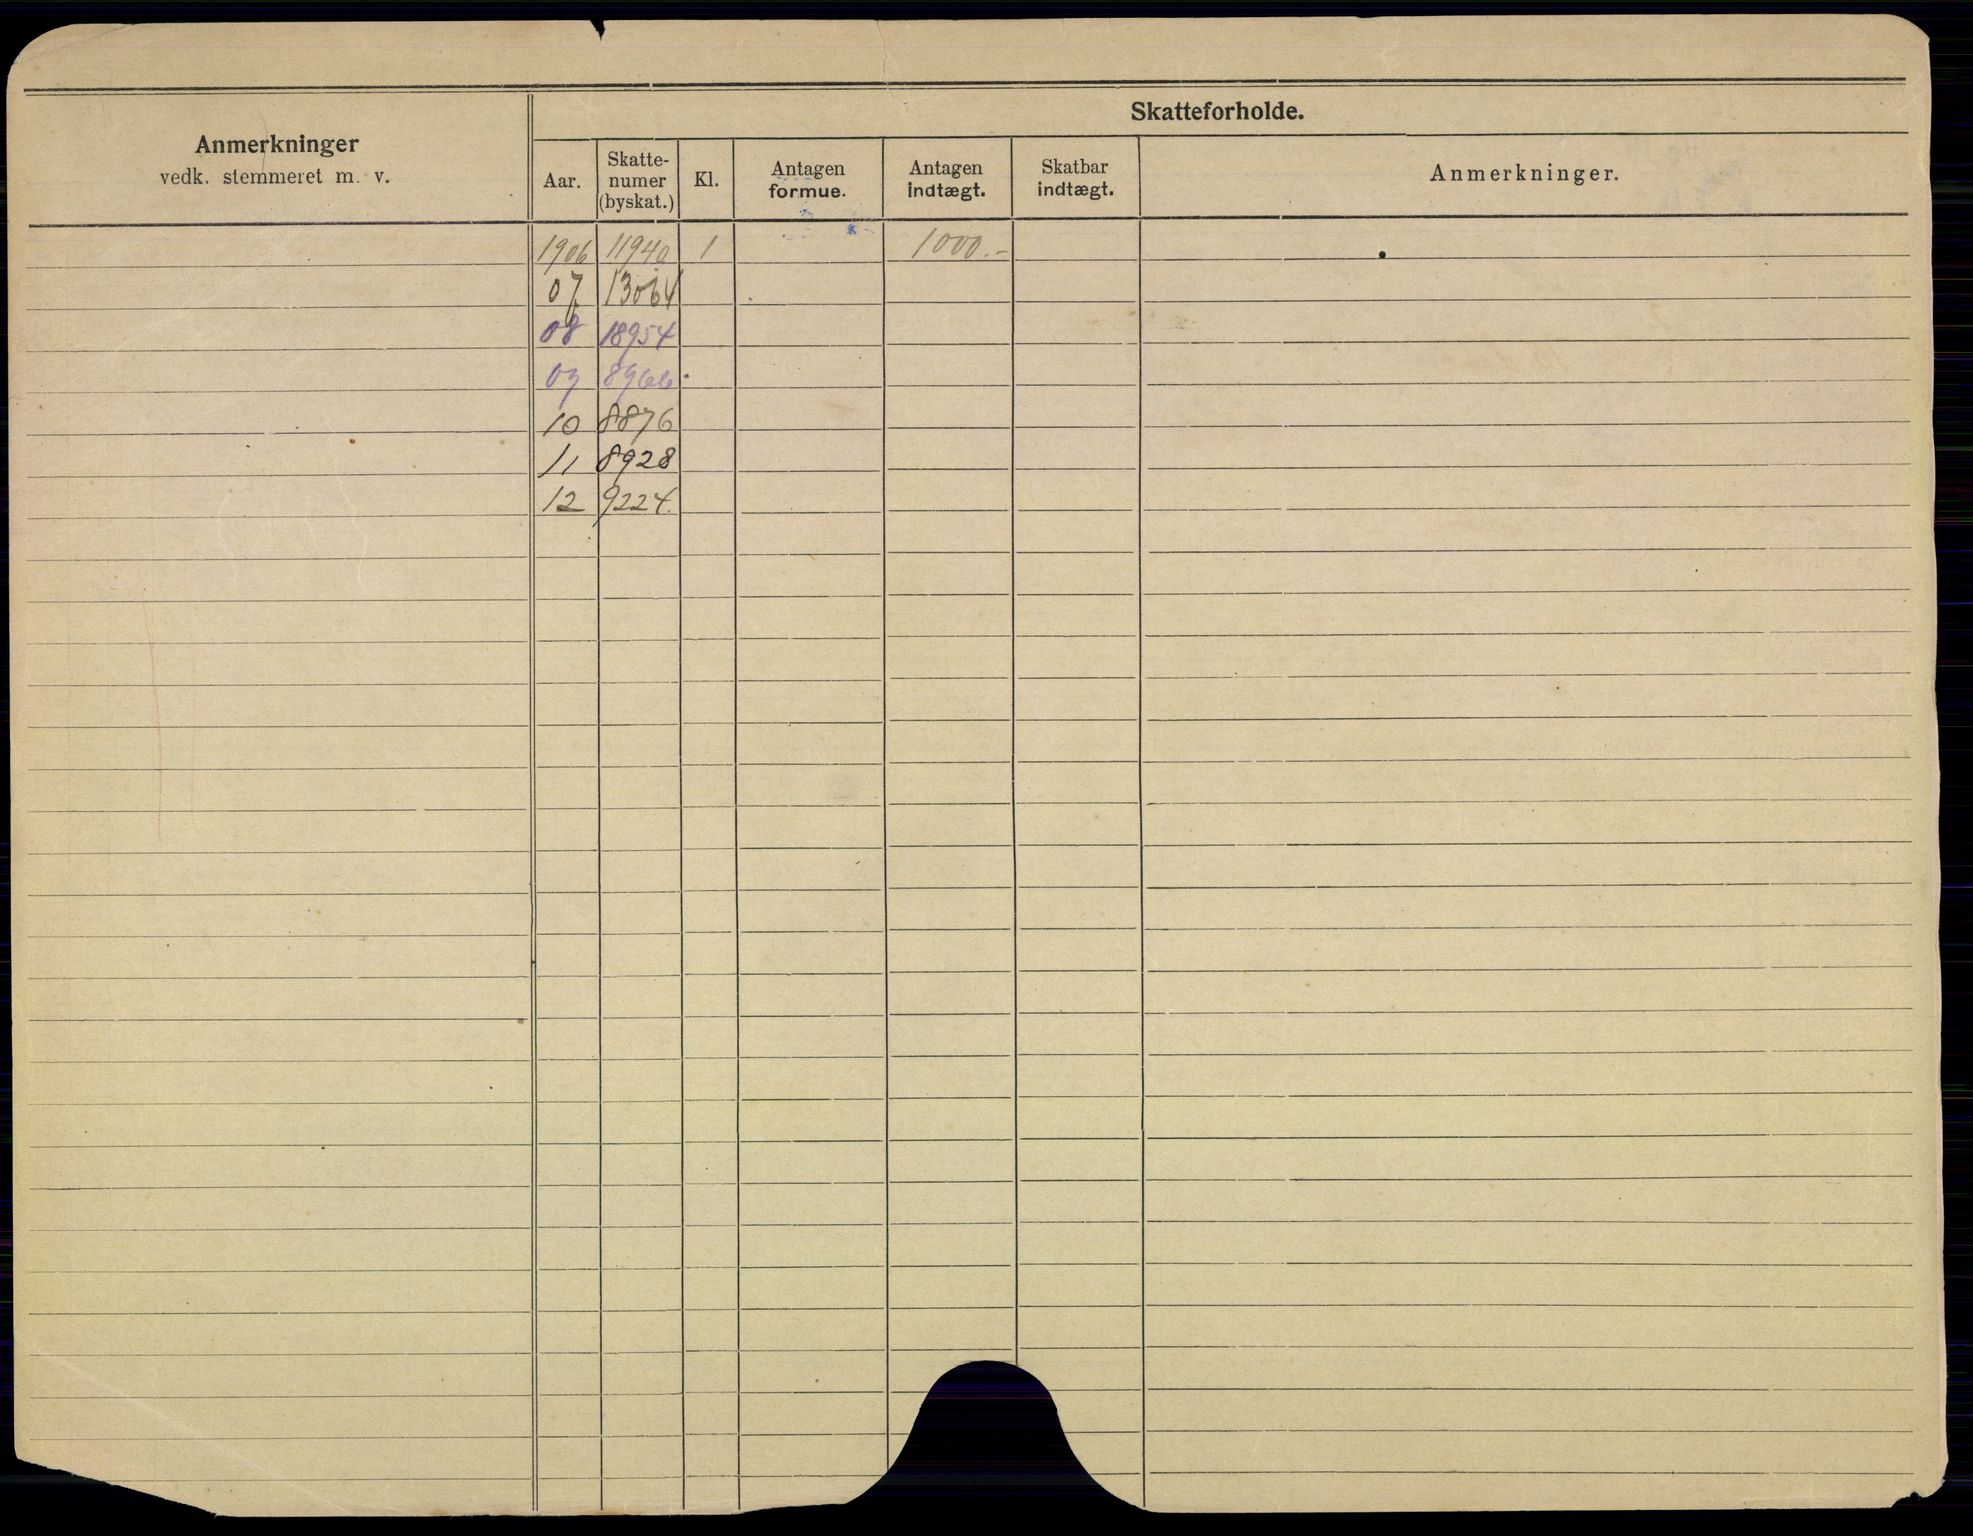 SAO, Oslo folkeregister, Registerkort, G/Gb/L0013: Menn, 1912